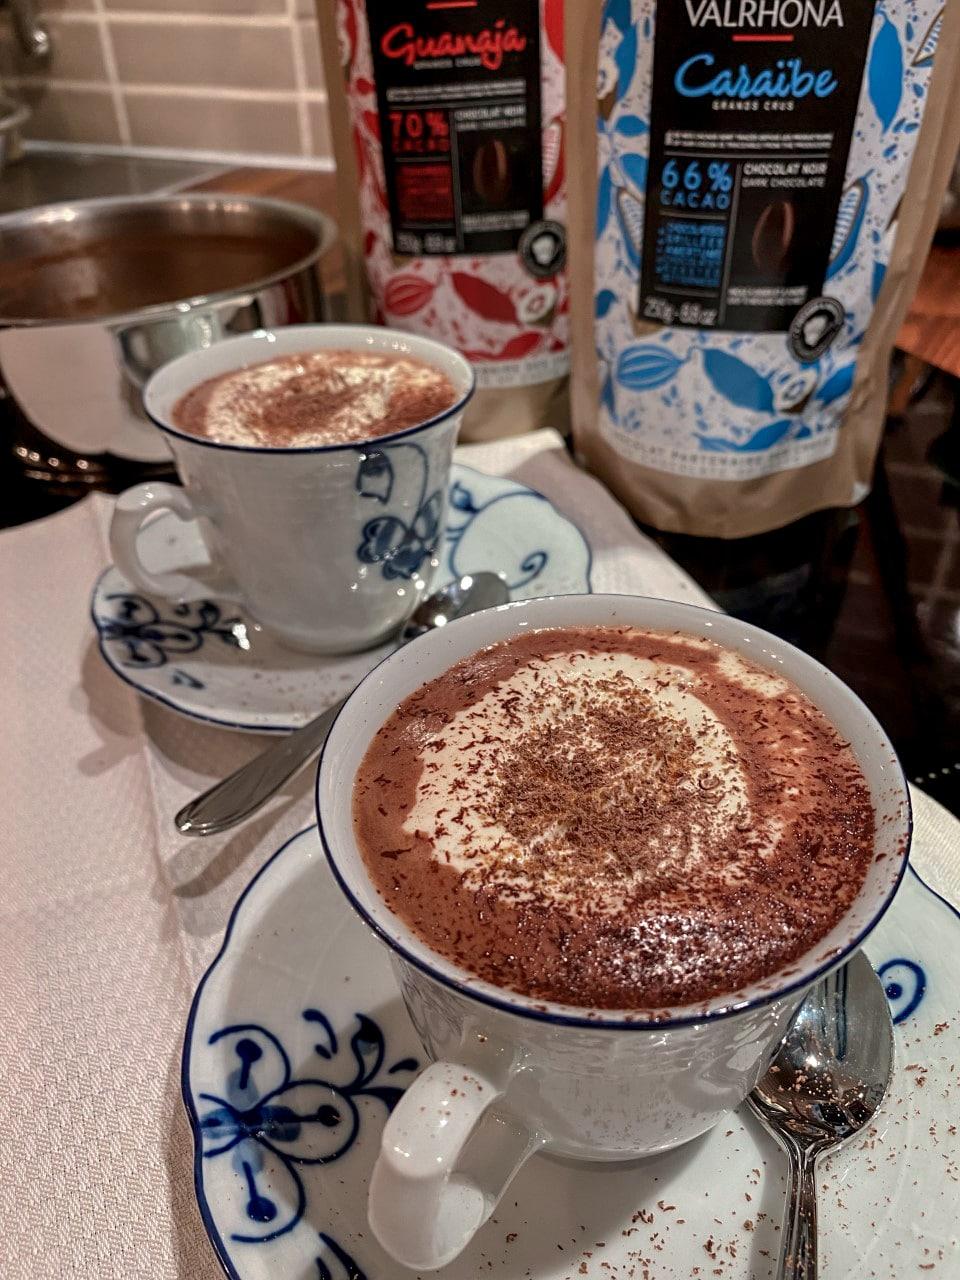 varm sjokolade med Valrhona